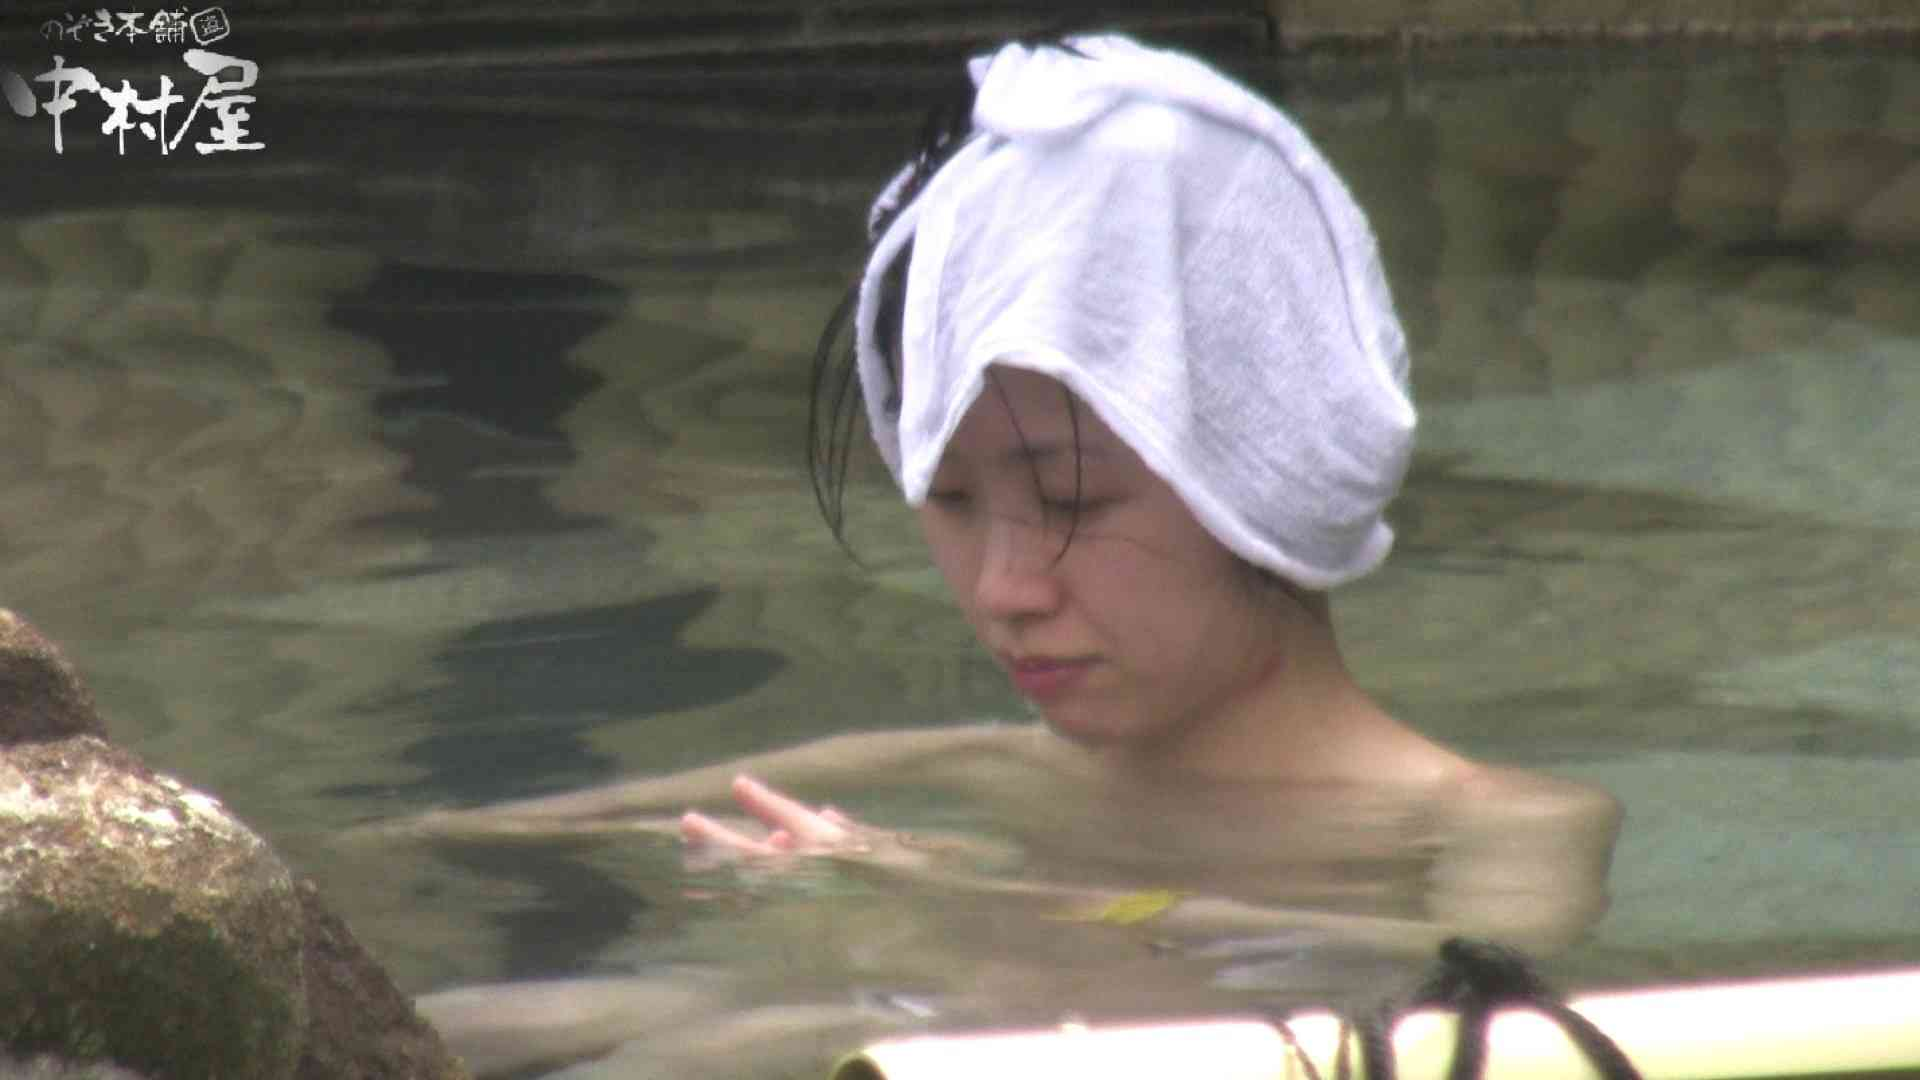 Aquaな露天風呂Vol.909 盗撮シリーズ | 露天風呂編  91PIX 53